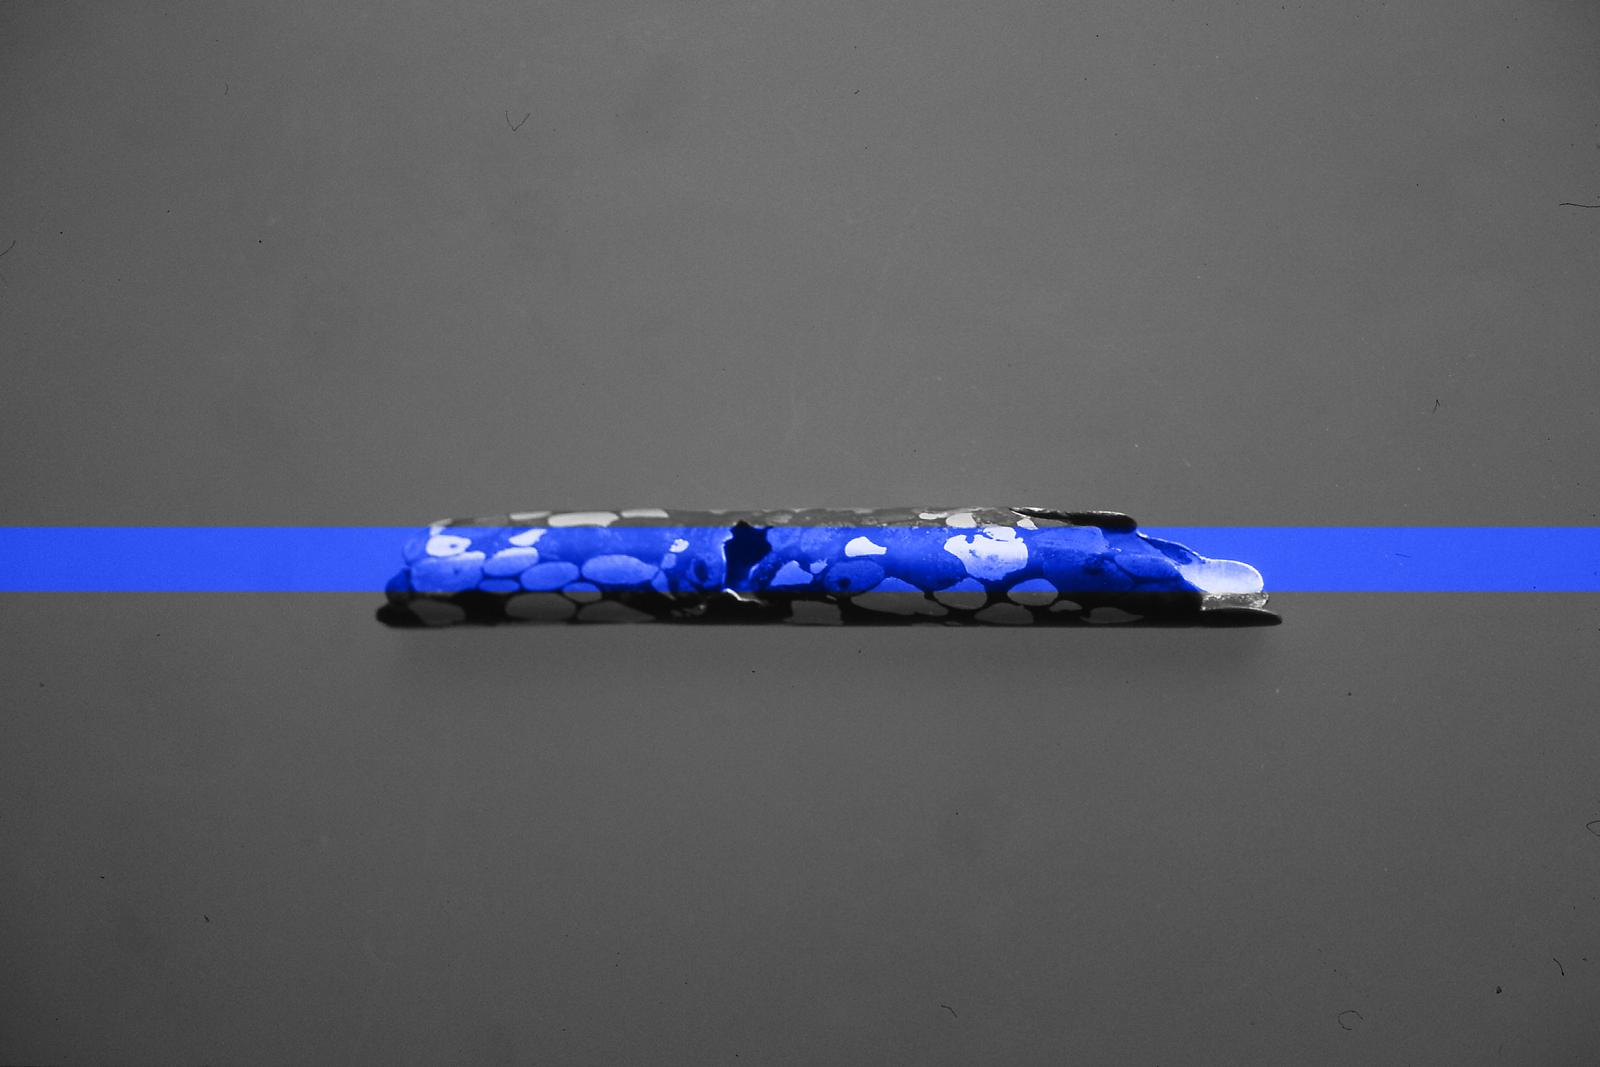 mokujama-curso-joyeria-color